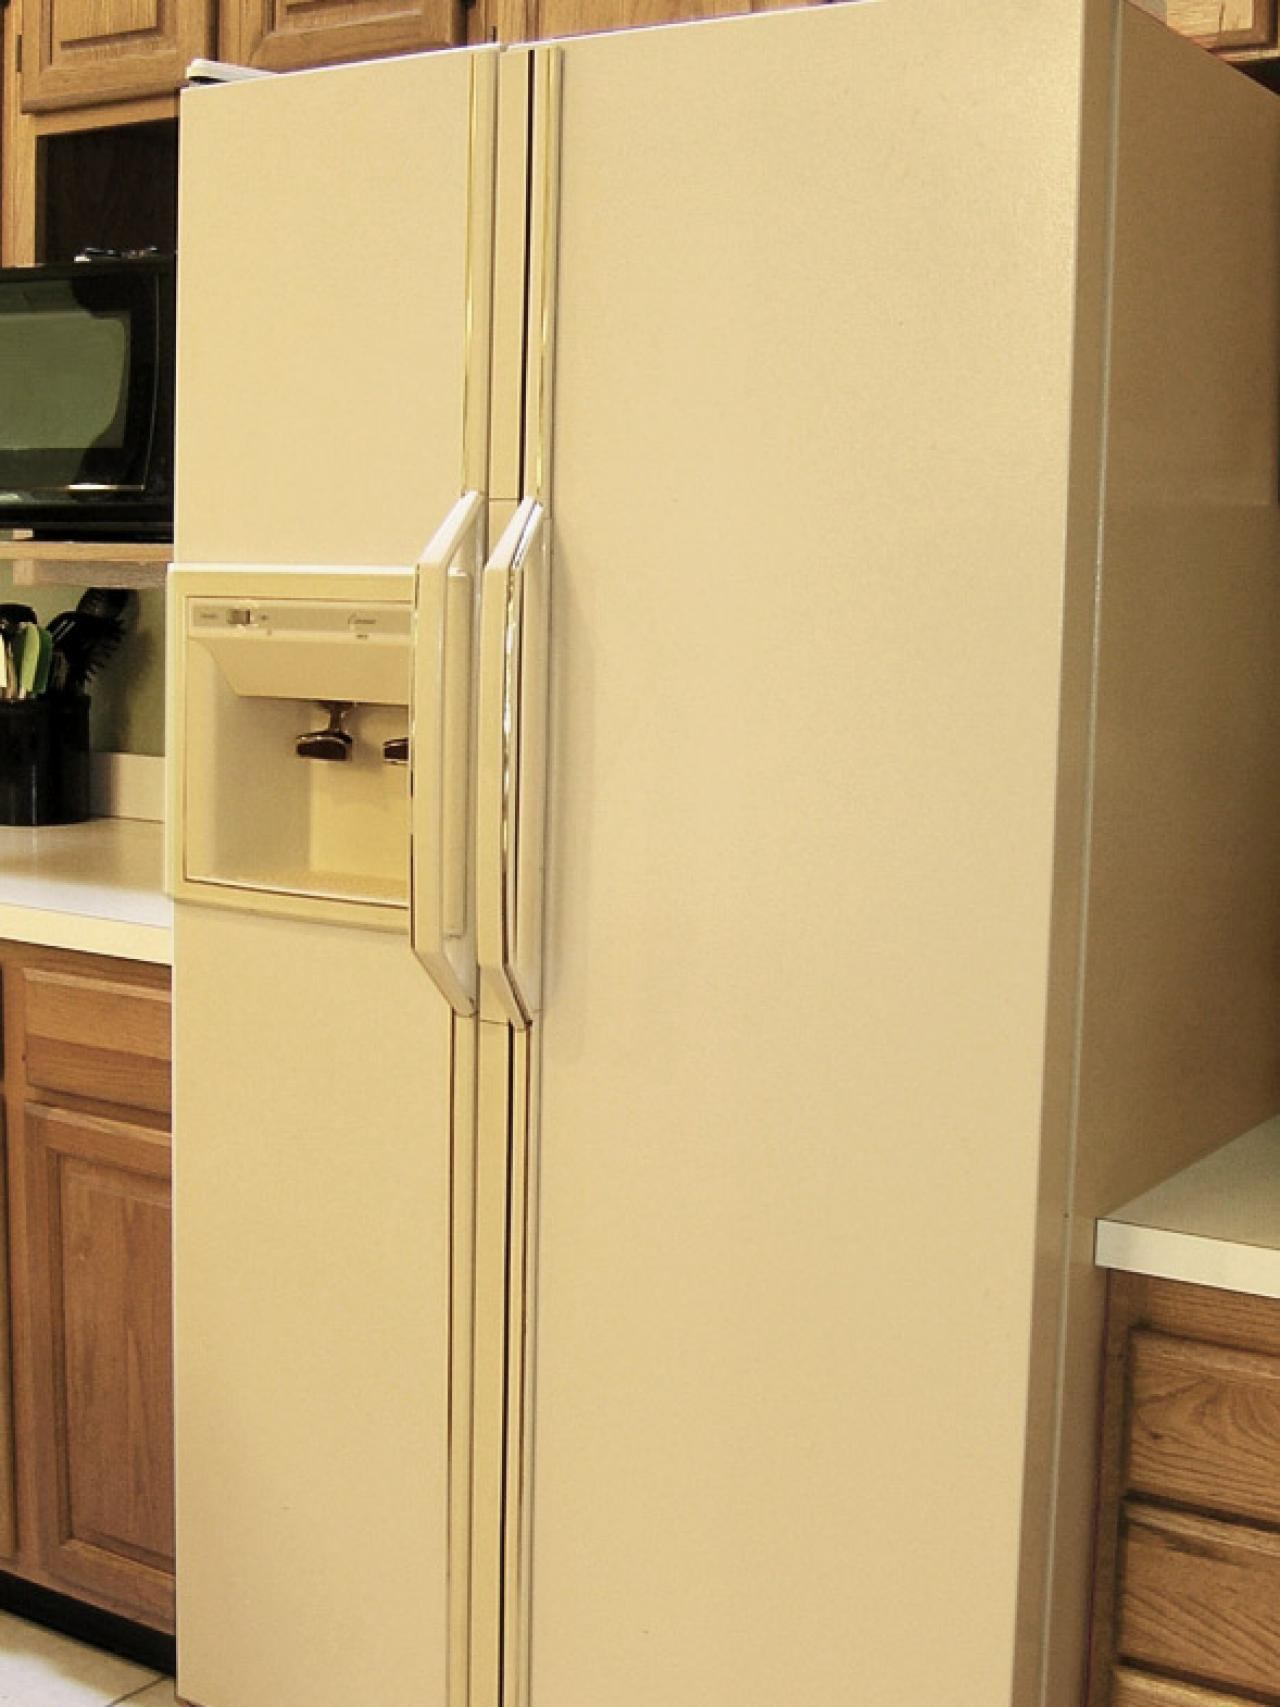 CI-Liquid-Stainless-Steel_Painted-Refrigerator-Before_s3x4.jpg.rend.hgtvcom.1280.1707